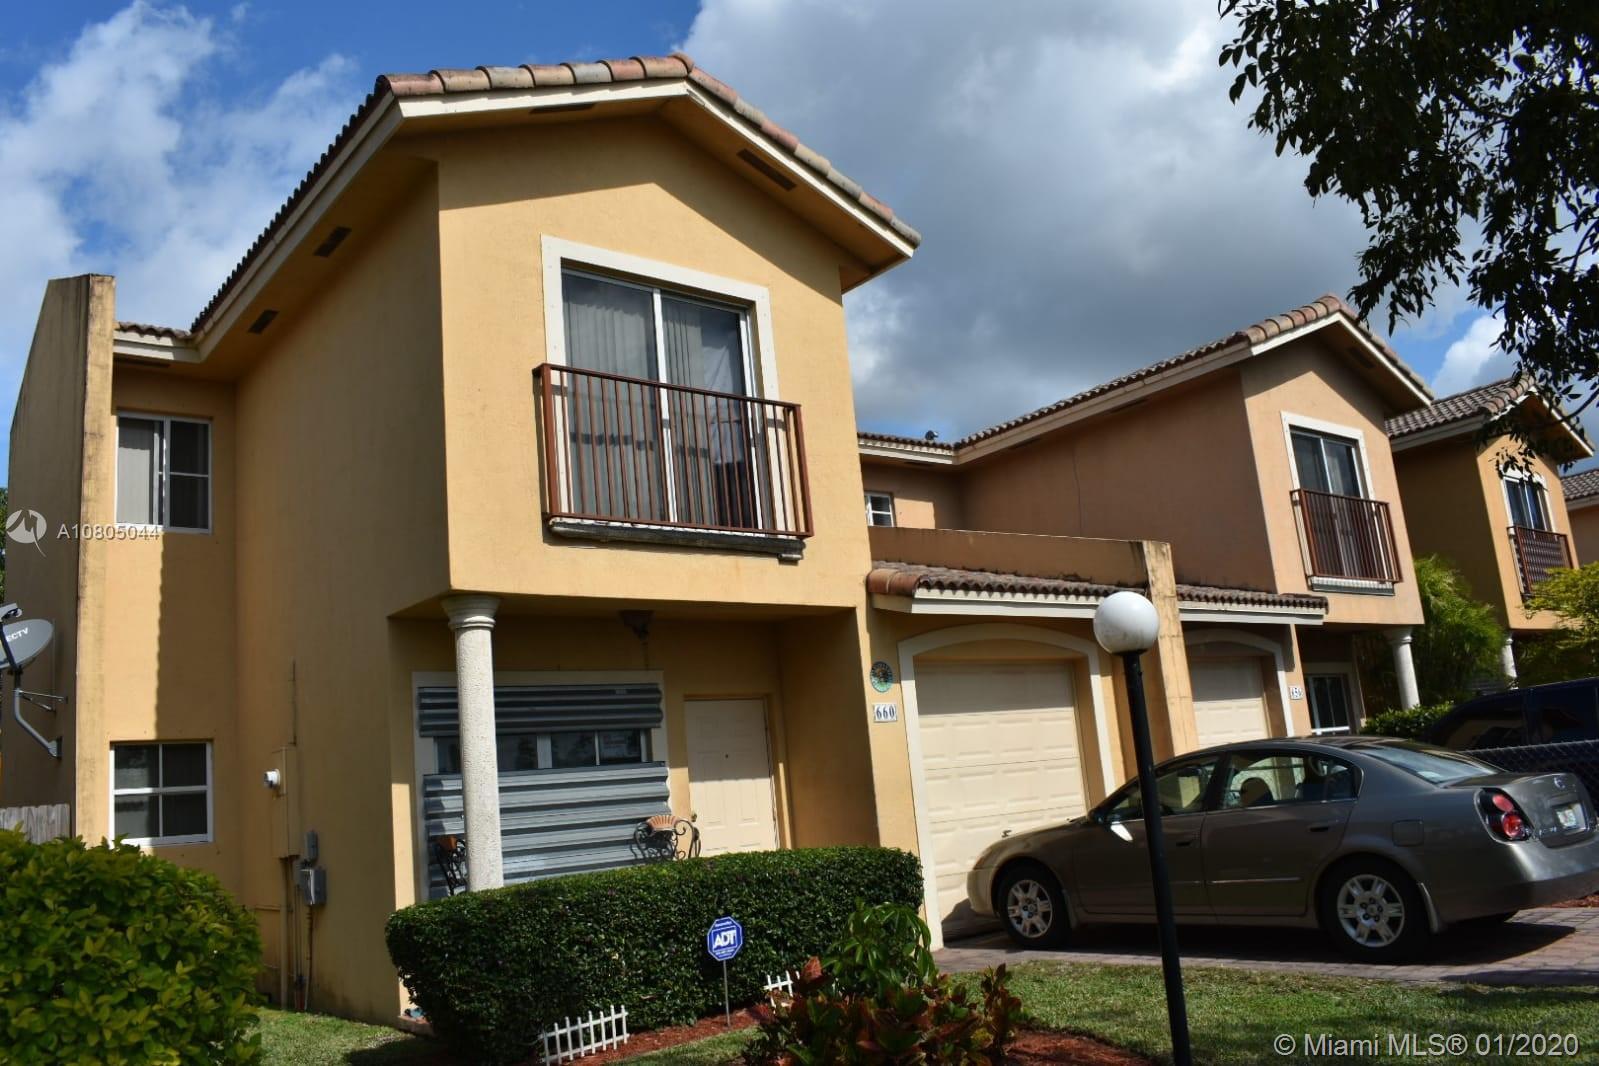 785 SW 6th Ct, Florida City, FL 33034 - Florida City, FL real estate listing